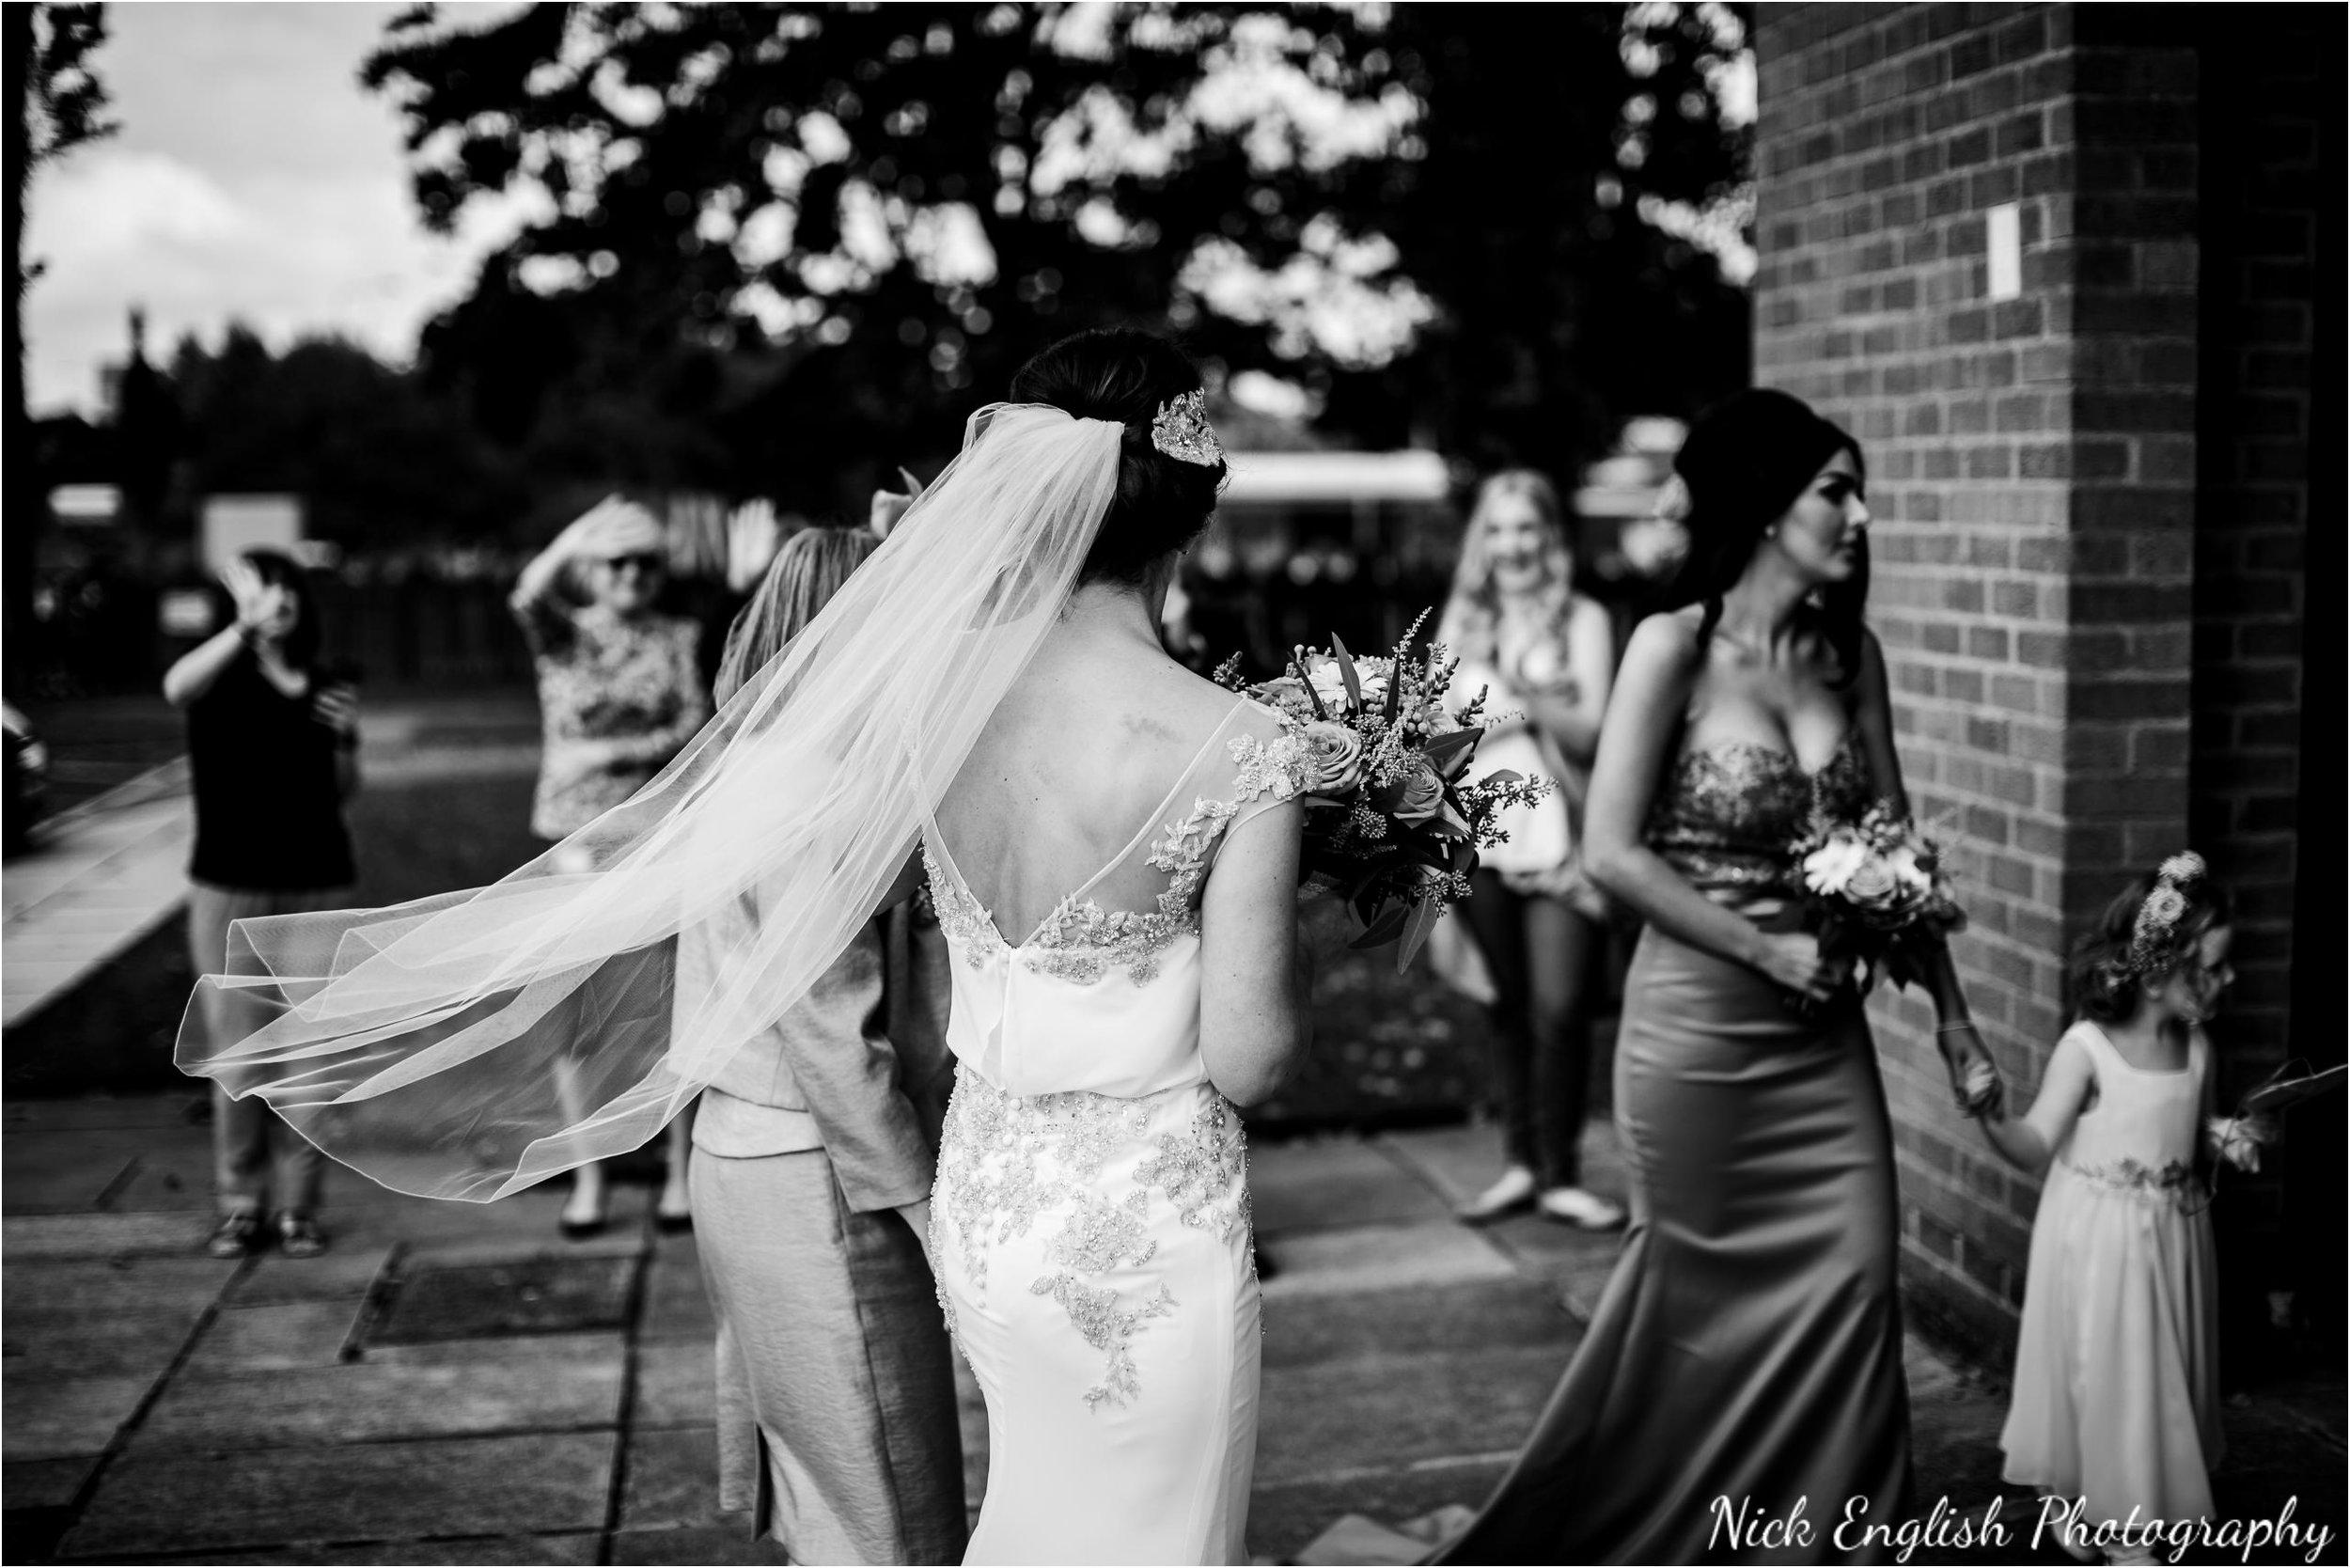 Stacey-Ash-Wedding-Photographs-Stanley-House-Preston-Lancashire-42.jpg